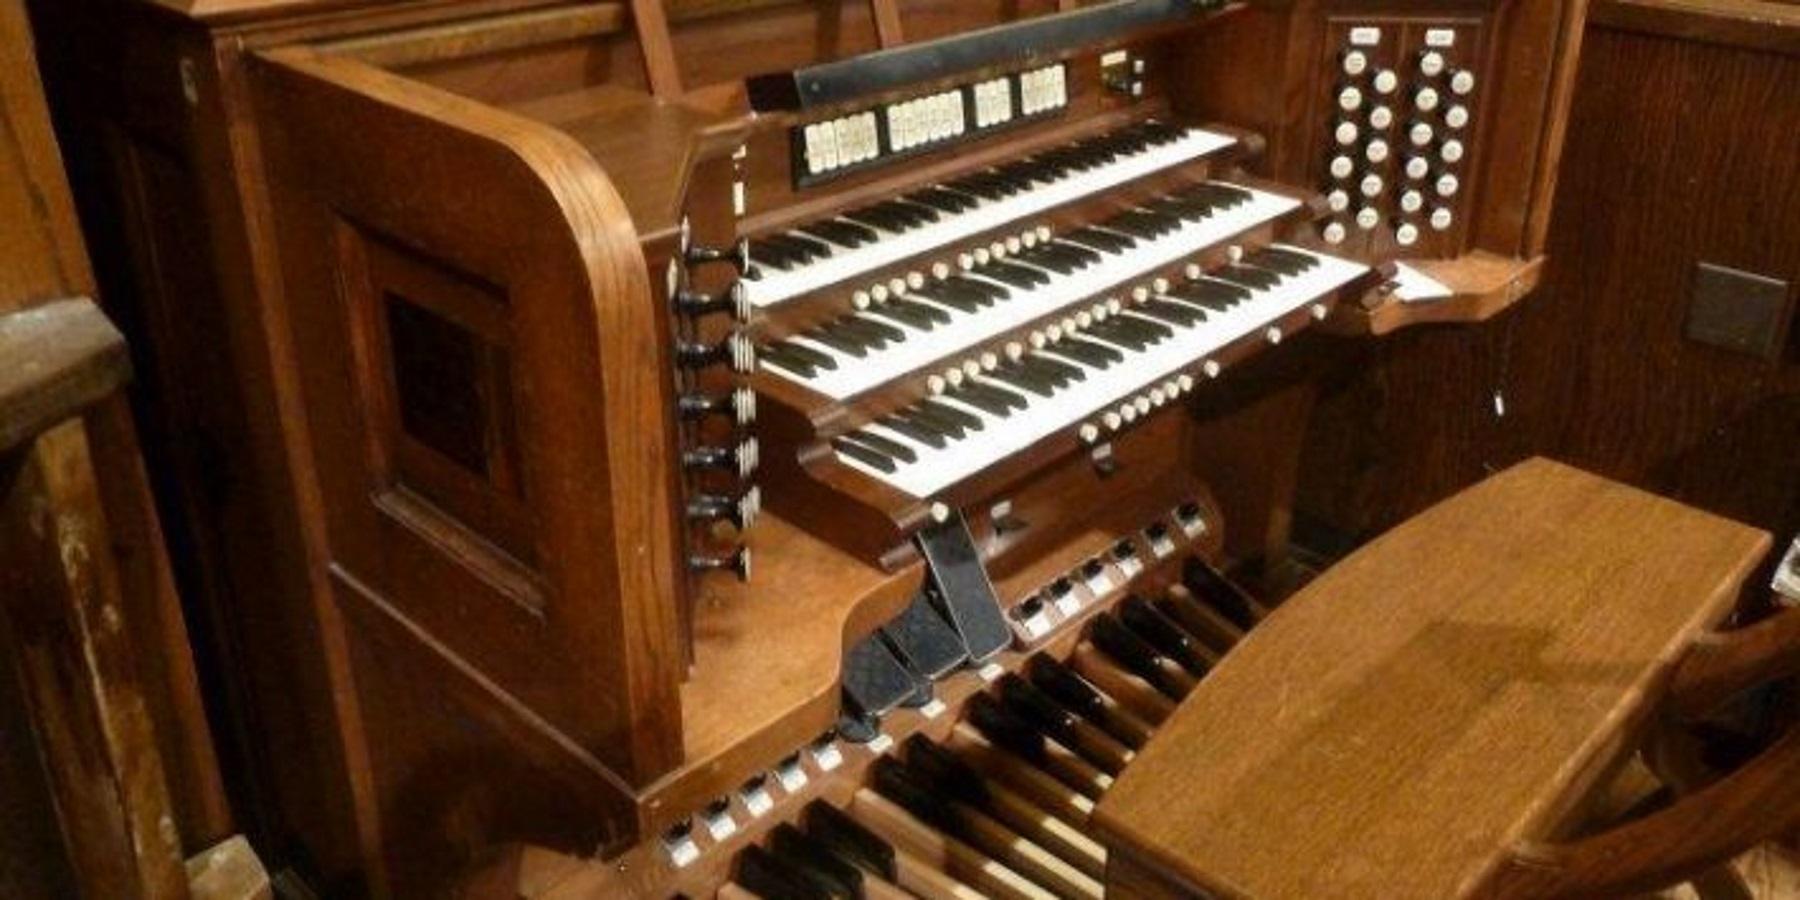 Aeolian-Skinner, G. Donald Harrison pipe organ